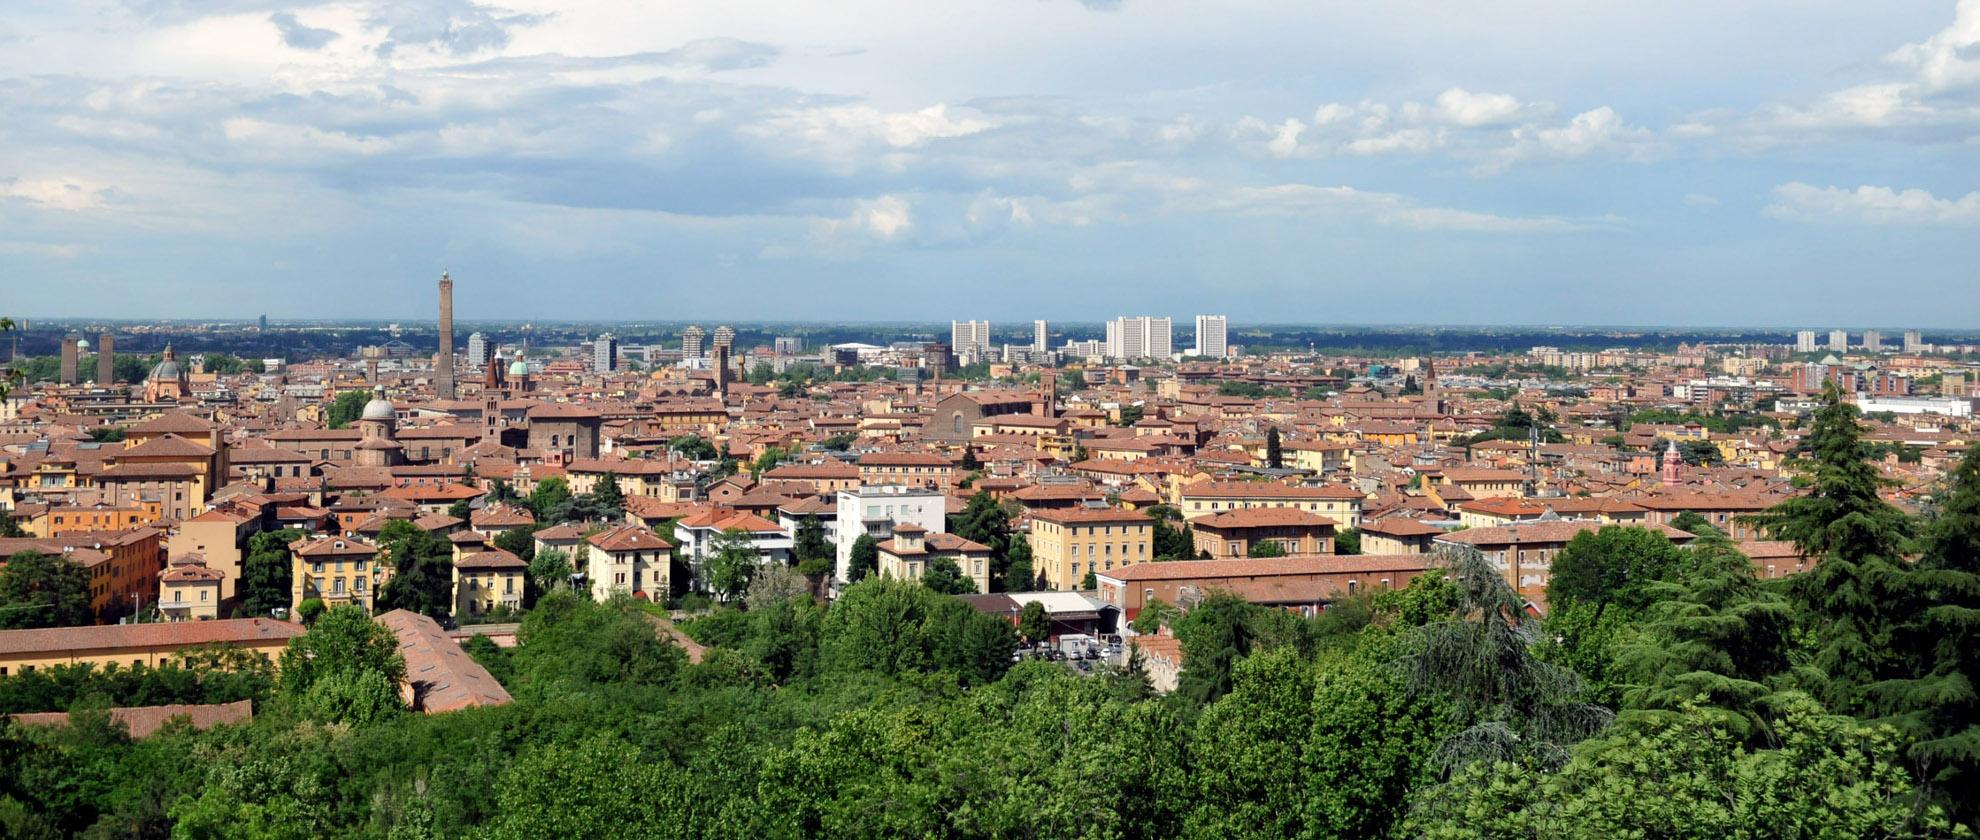 bologna - Panorama